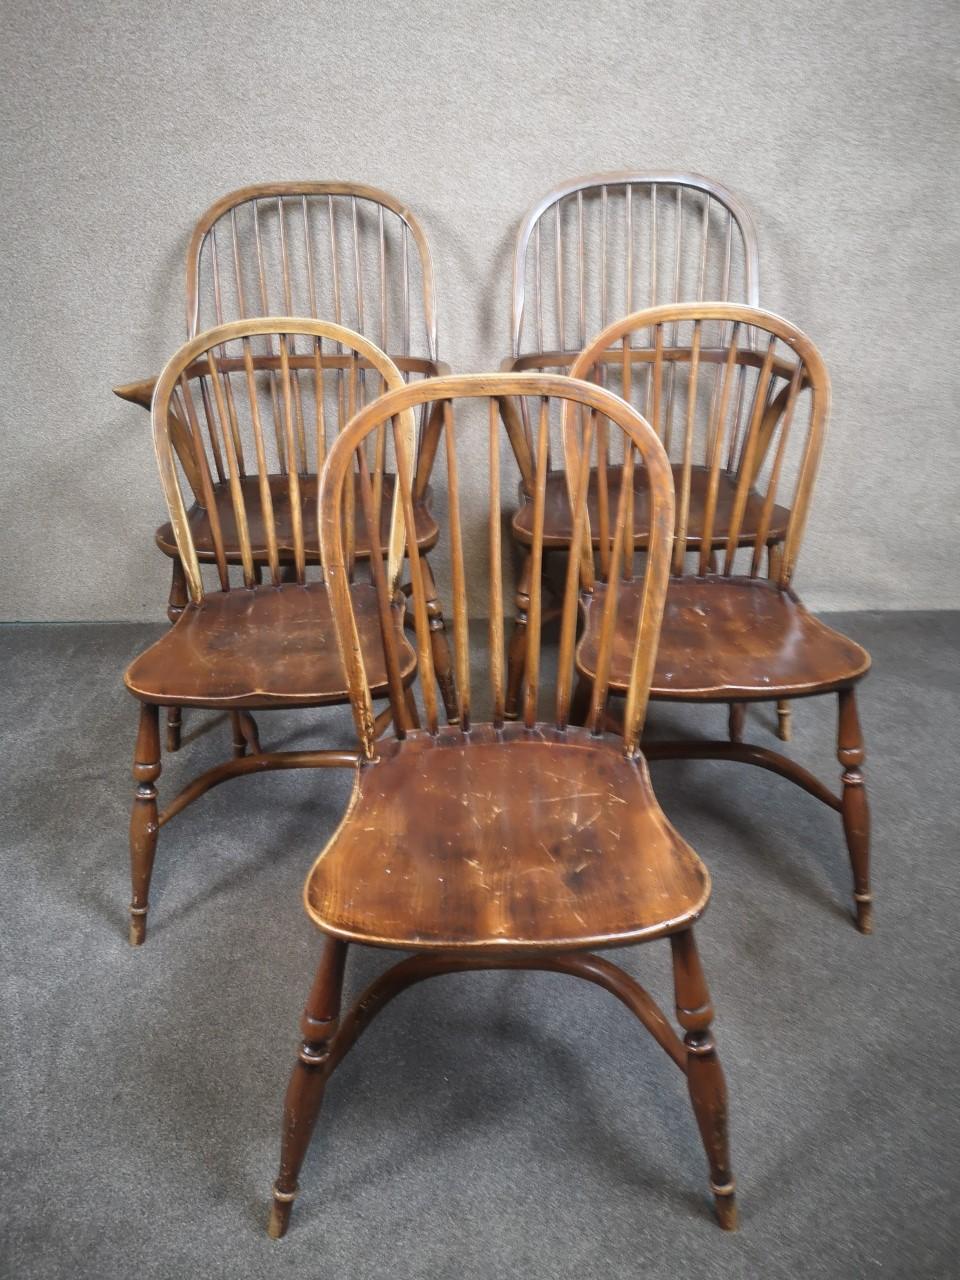 5 oak Windsor chairs(armless)画像